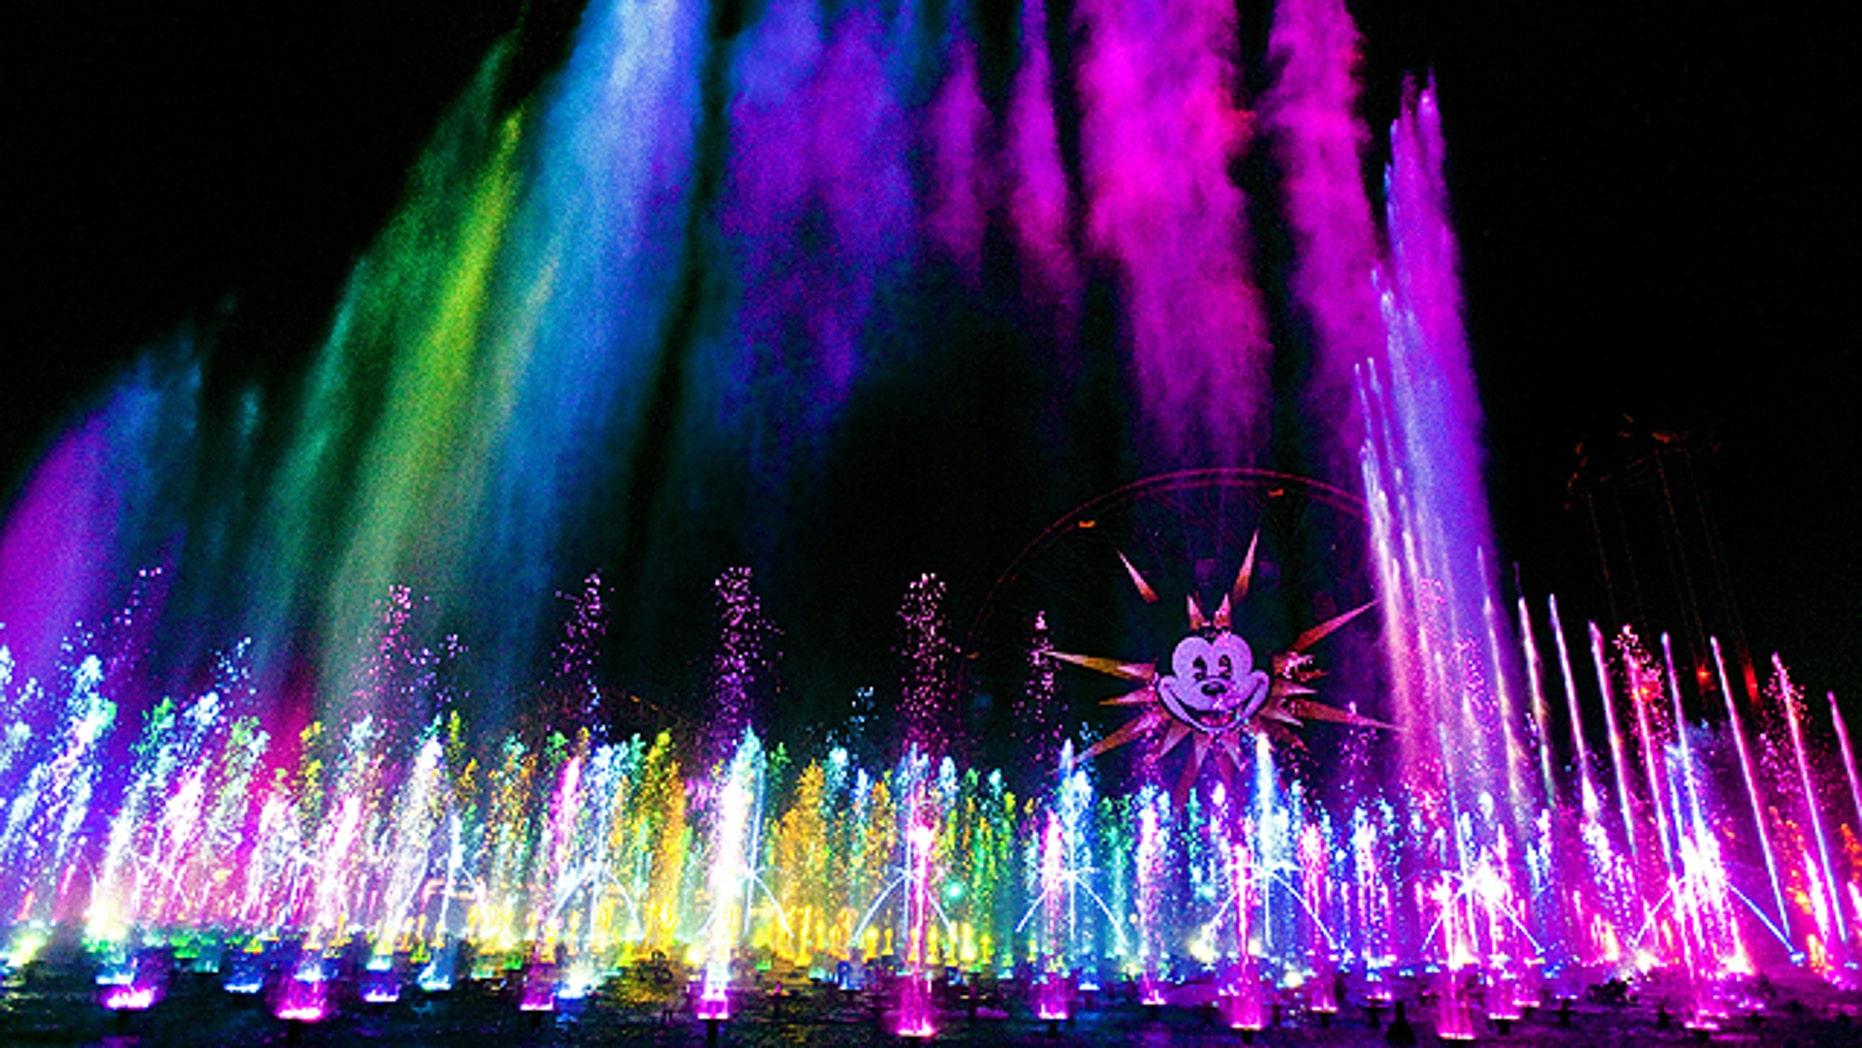 Disney's World of Color